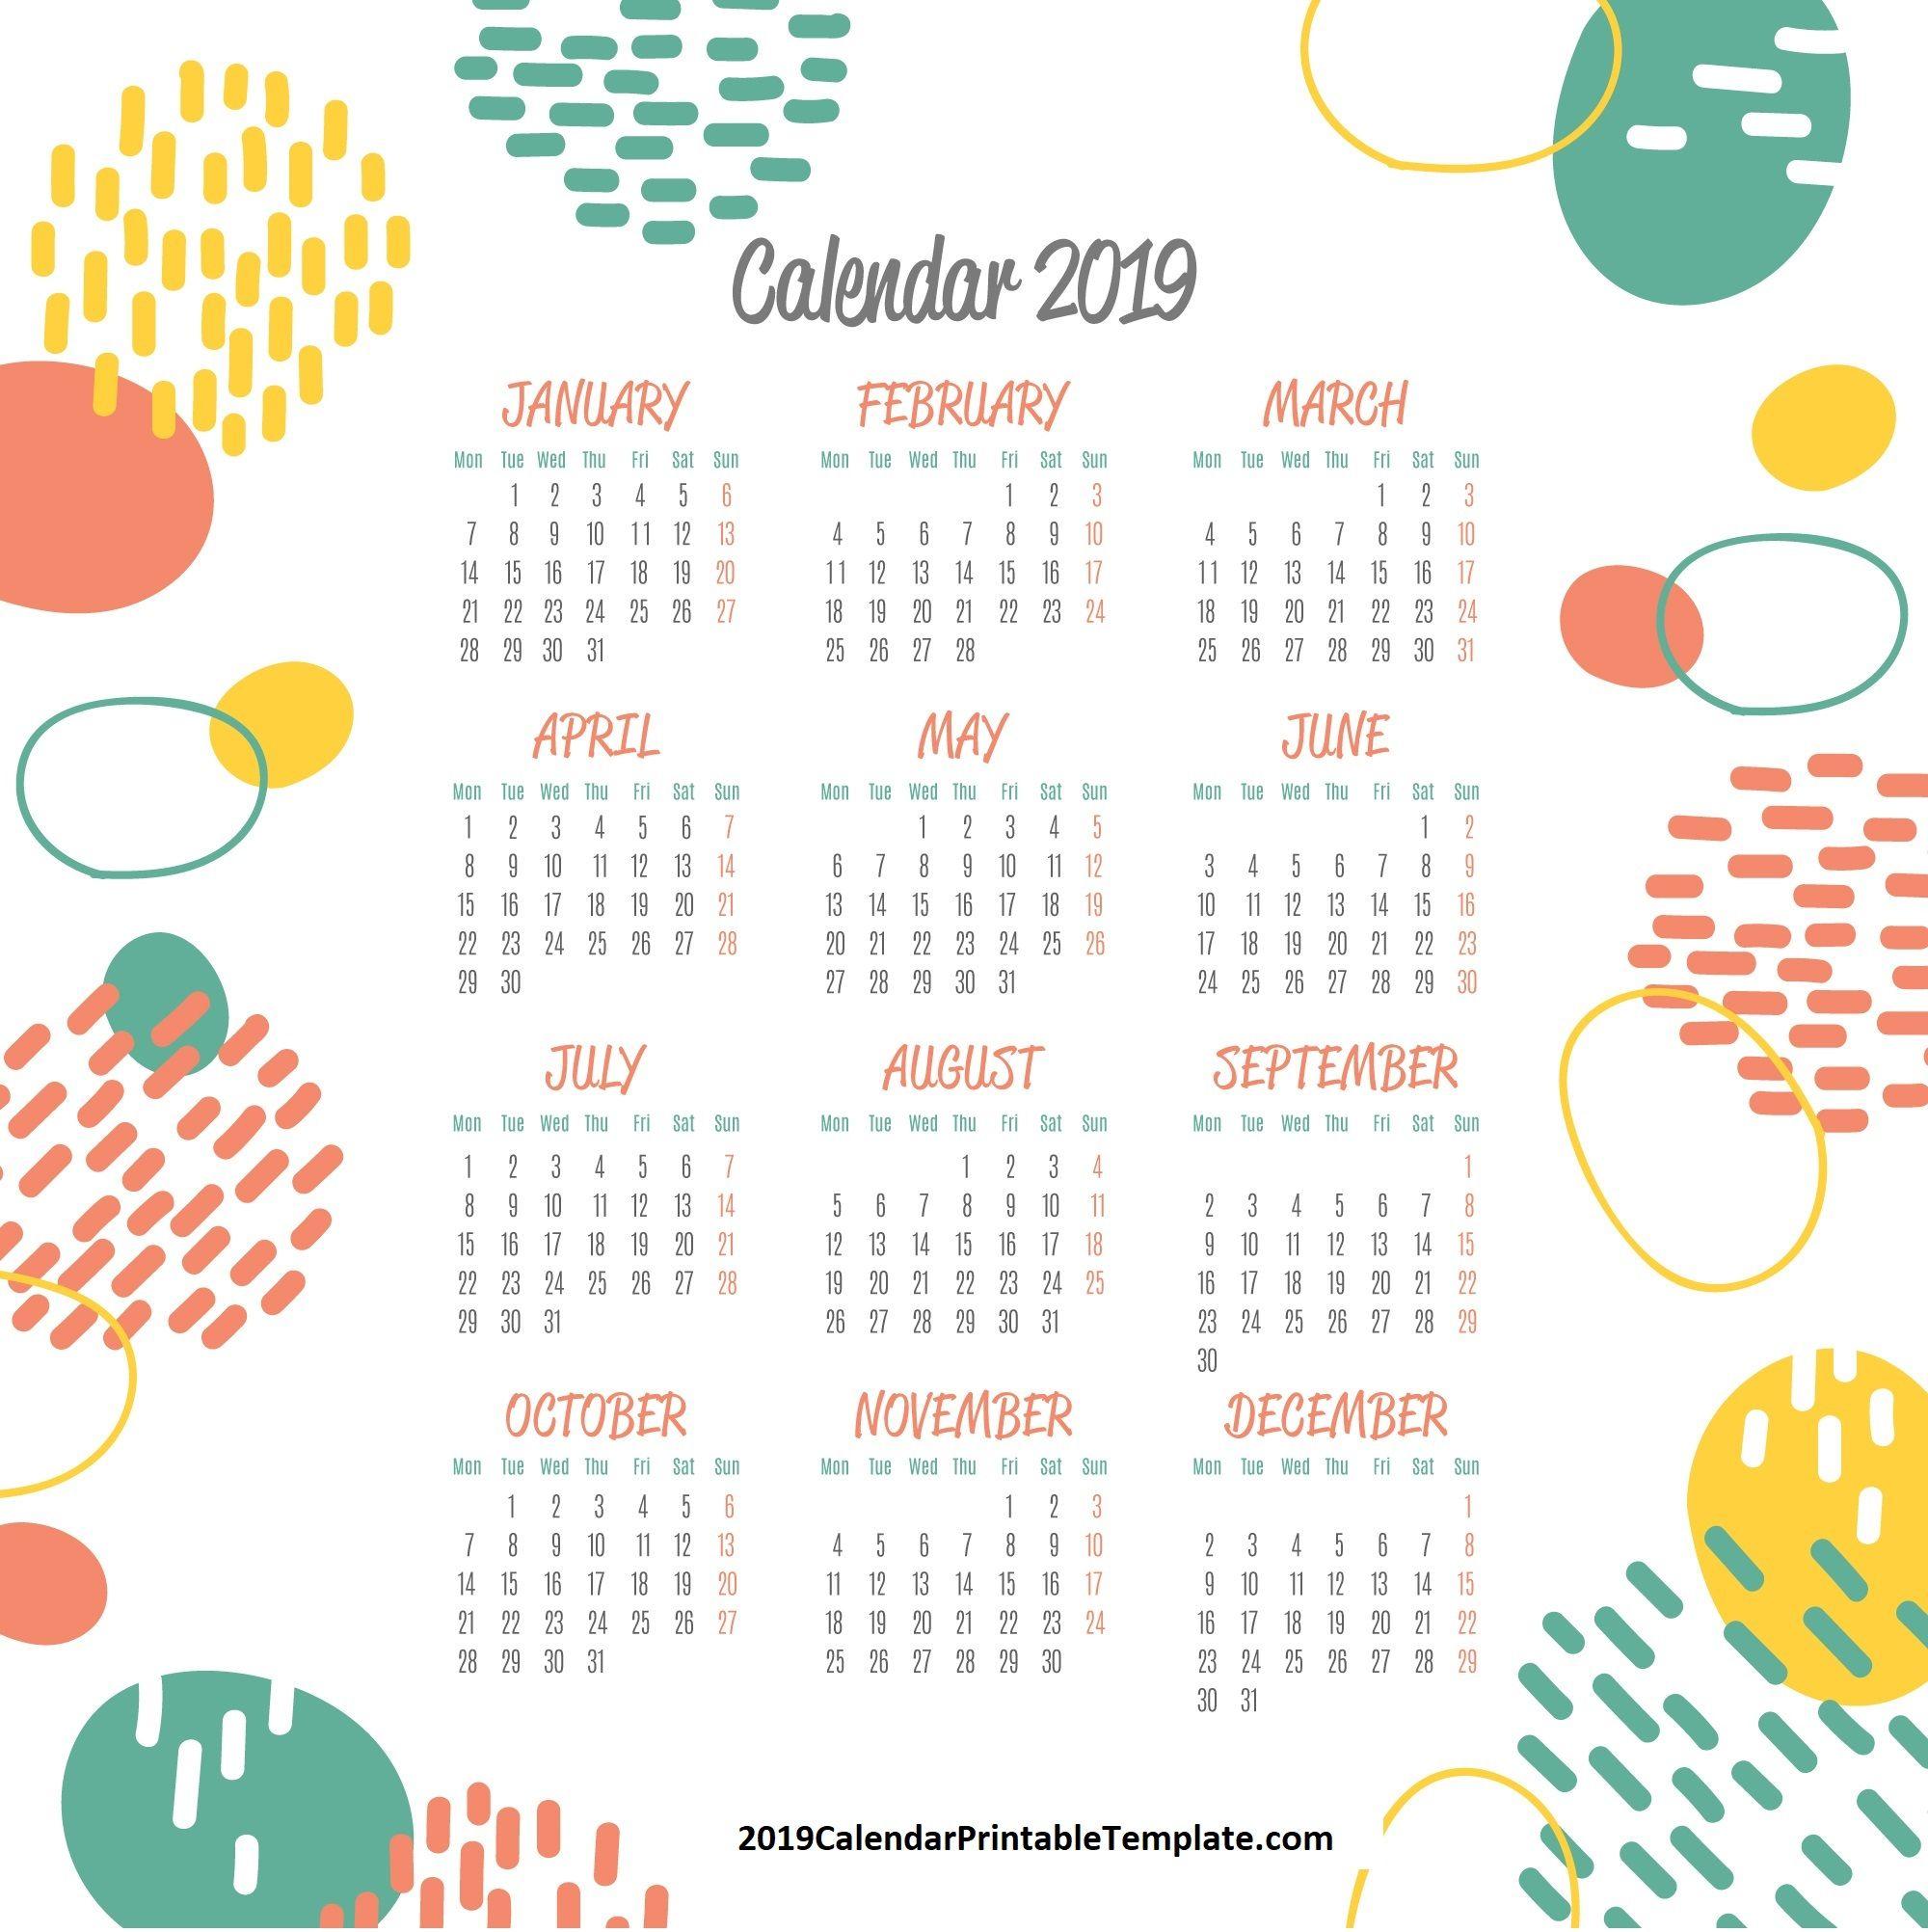 Pin By 2019calendarprintabletemplate On 2019 Calendar Printable